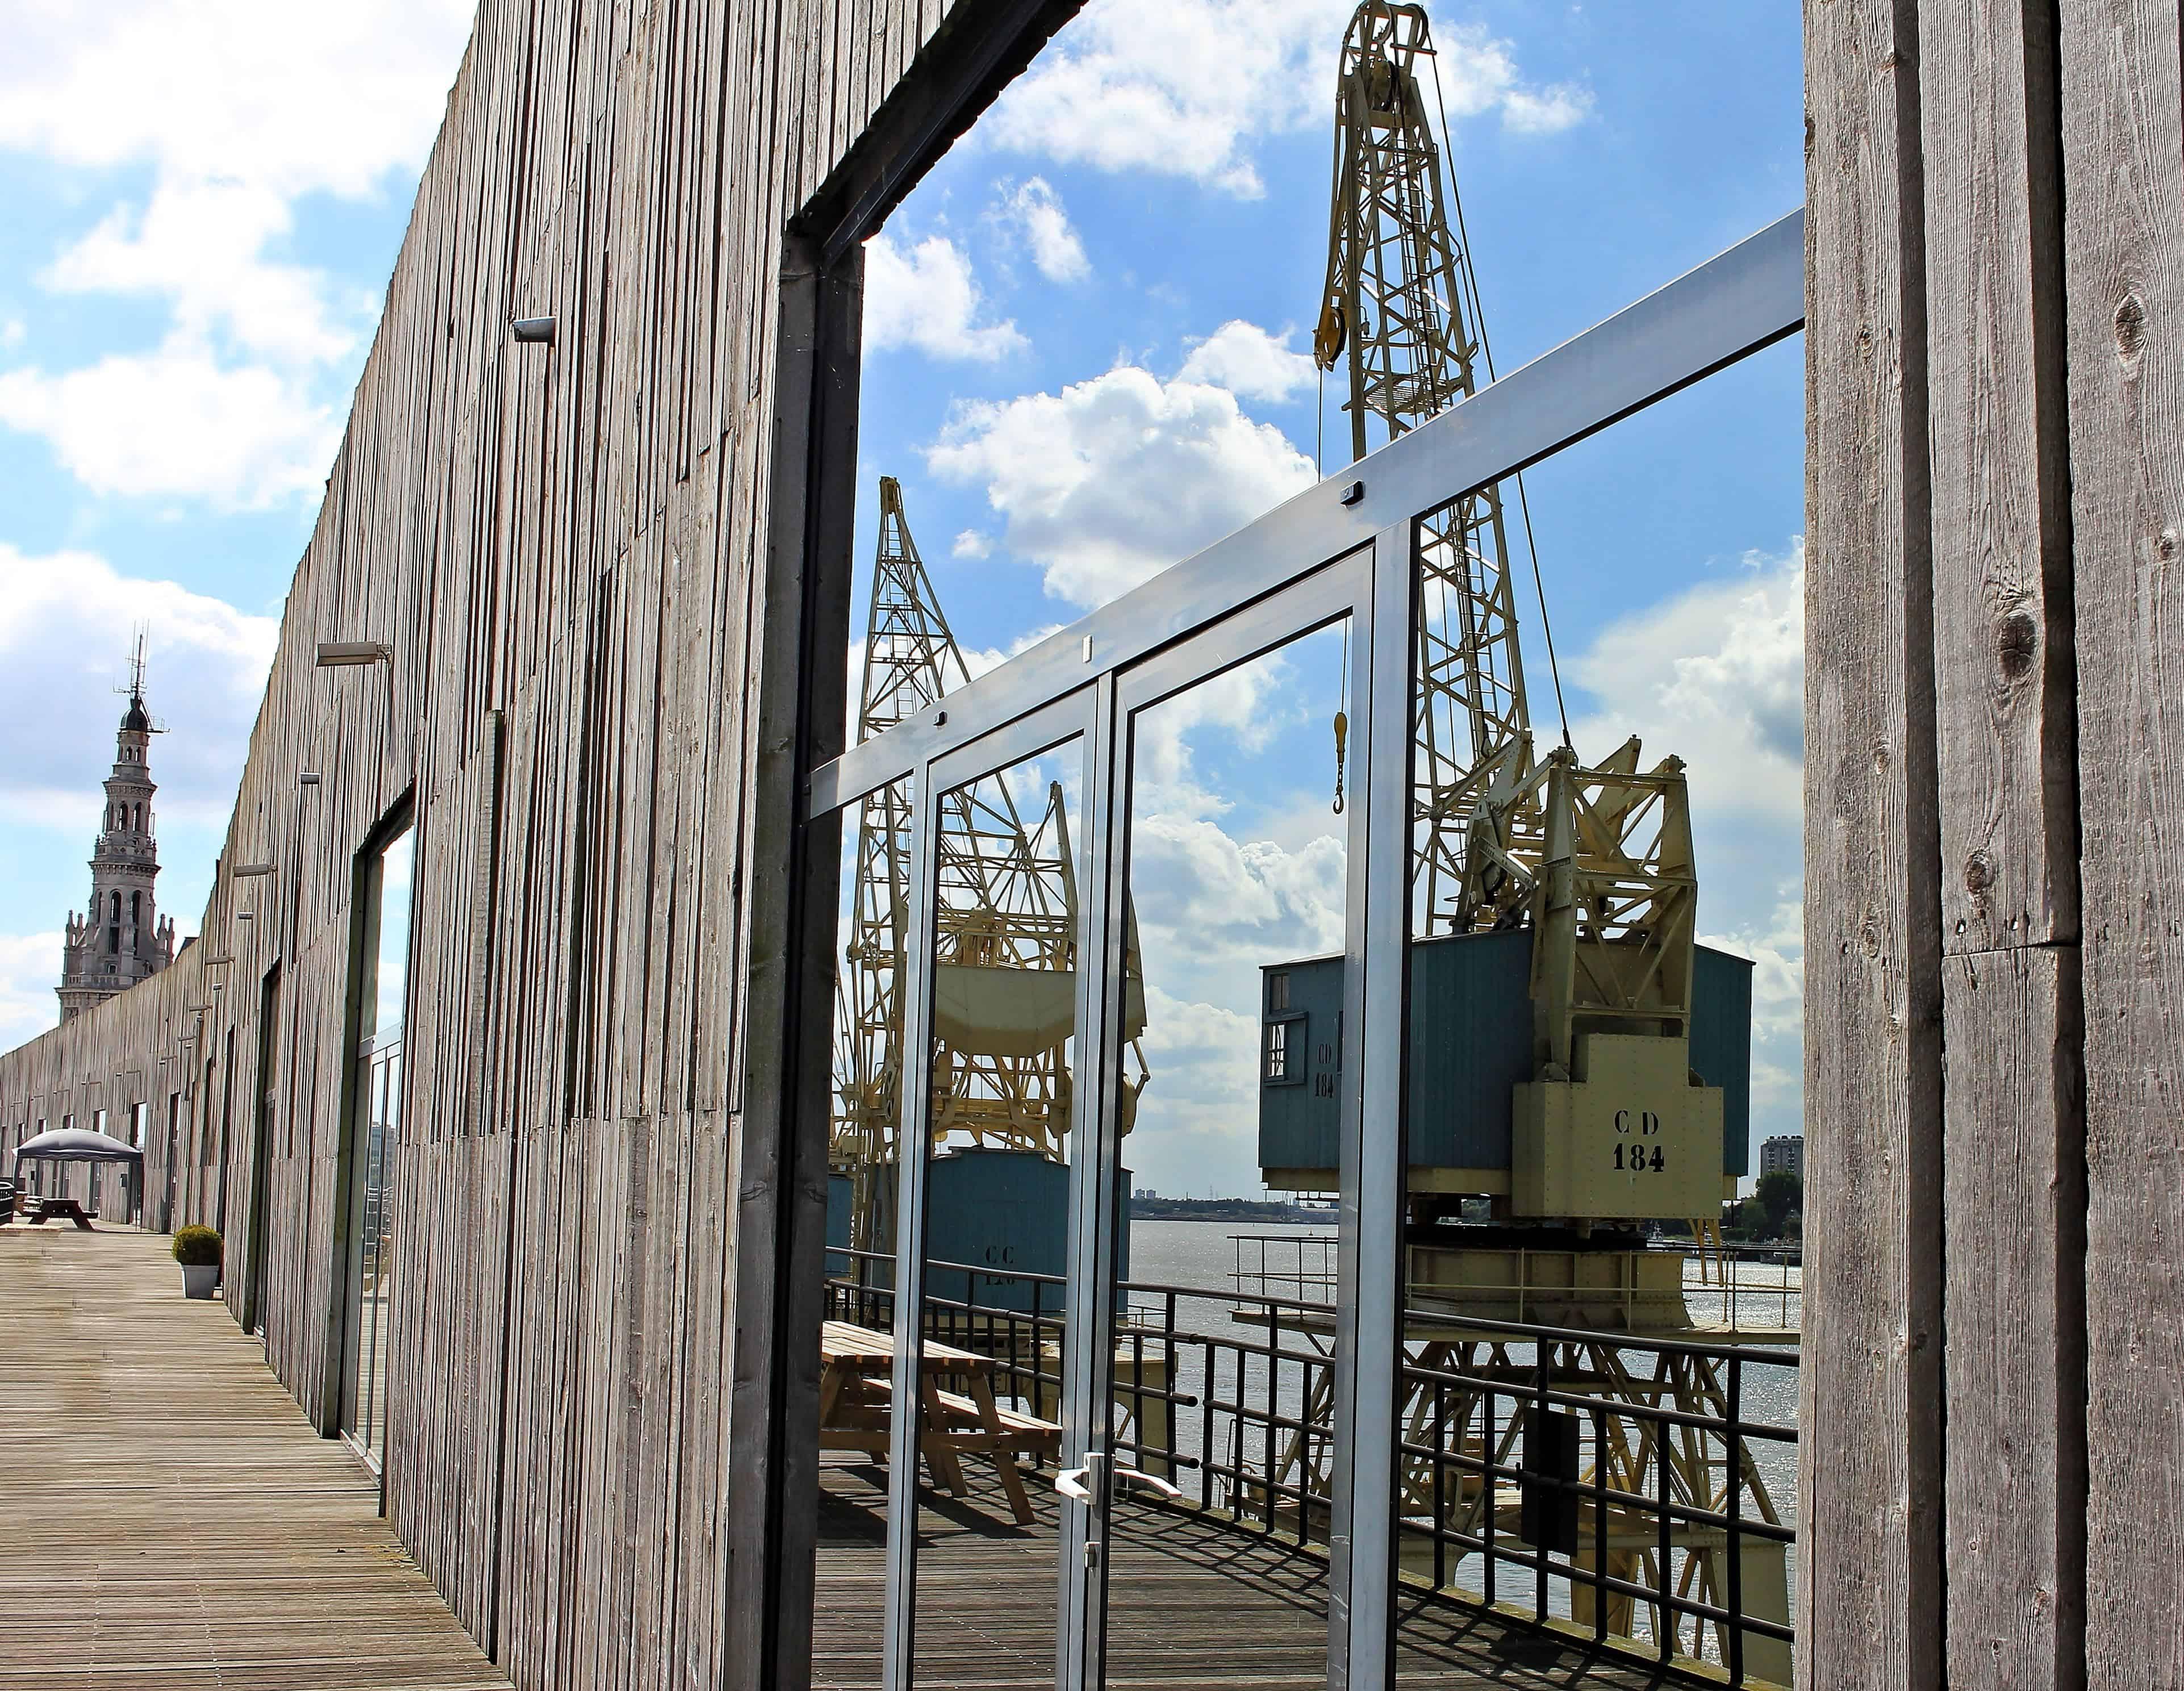 Foto gratis: architettura struttura vetro riflessione gru